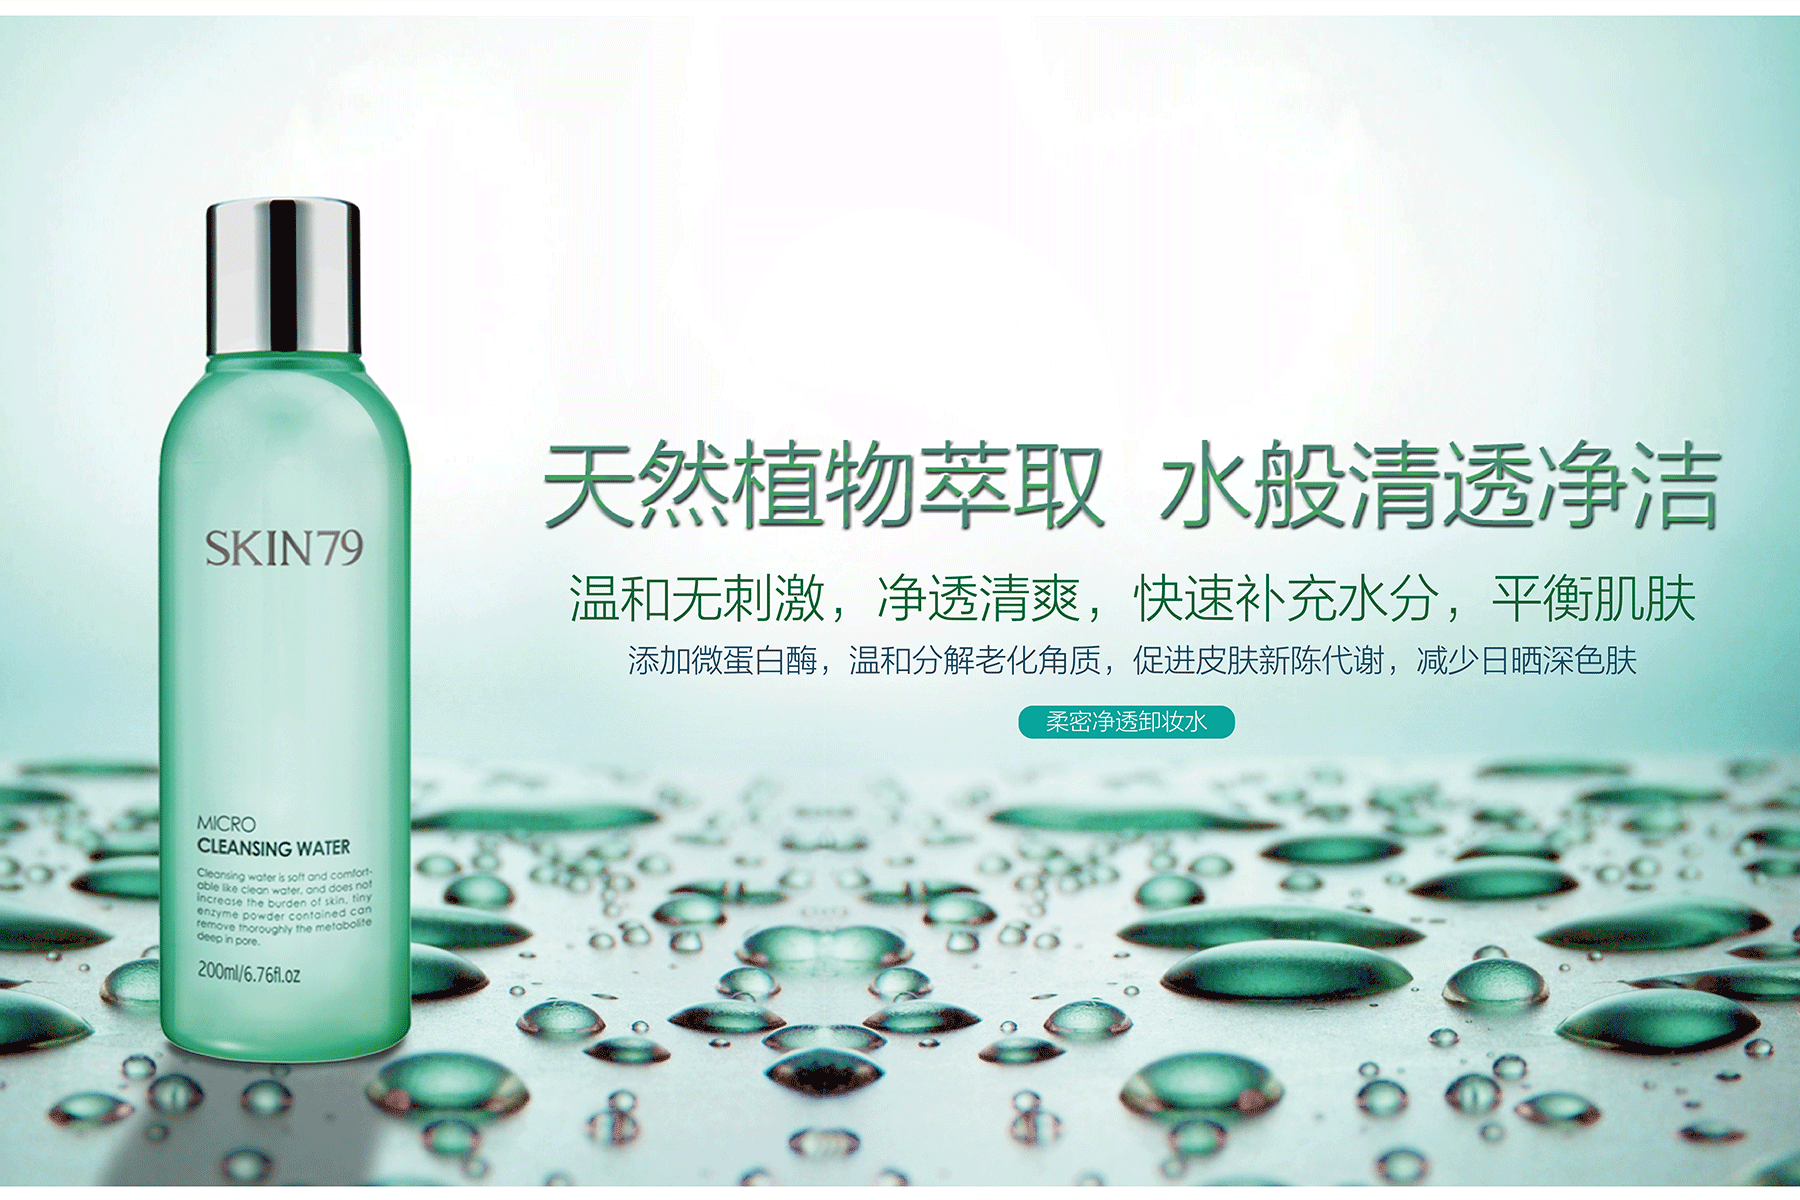 skin79柔密凈透卸妝水-海報